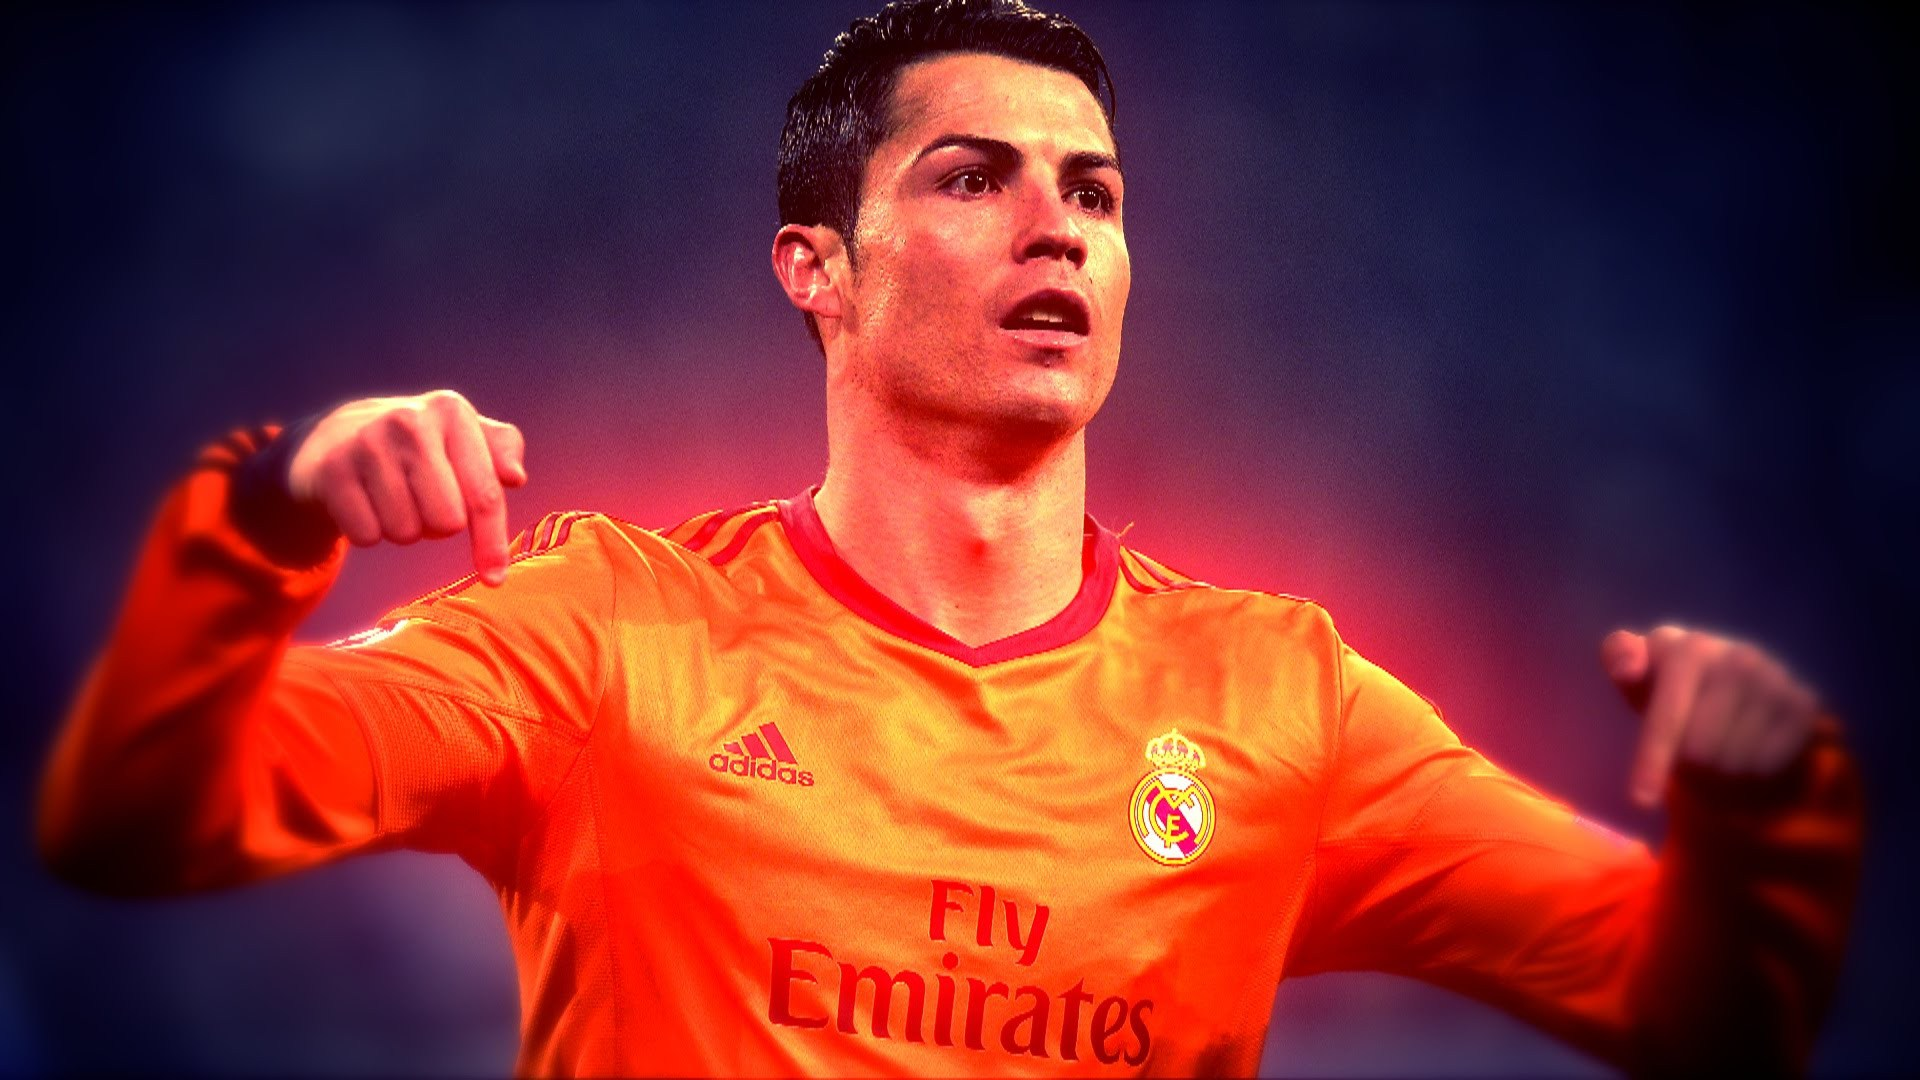 Cristiano Ronaldo Wallpapers HD